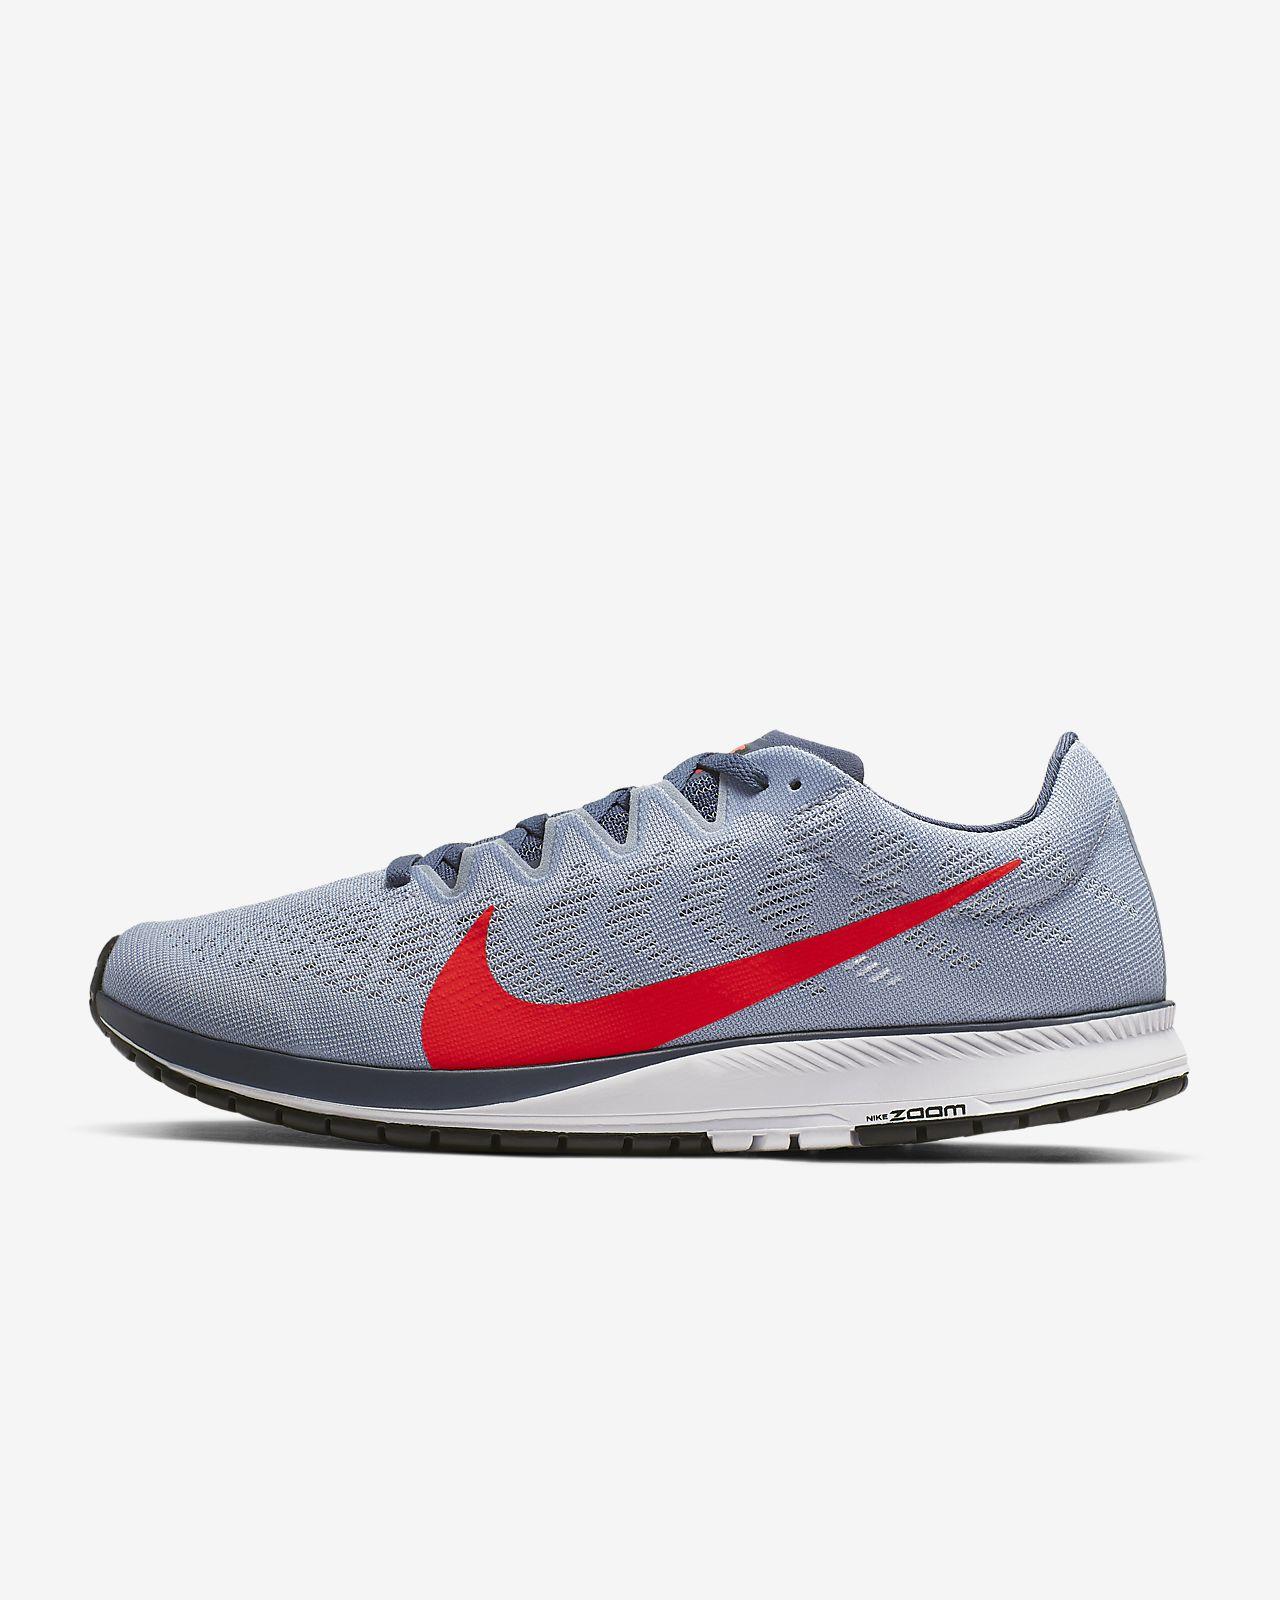 sports shoes 4dd3d 16061 ... Chaussure de running Nike Air Zoom Streak 7